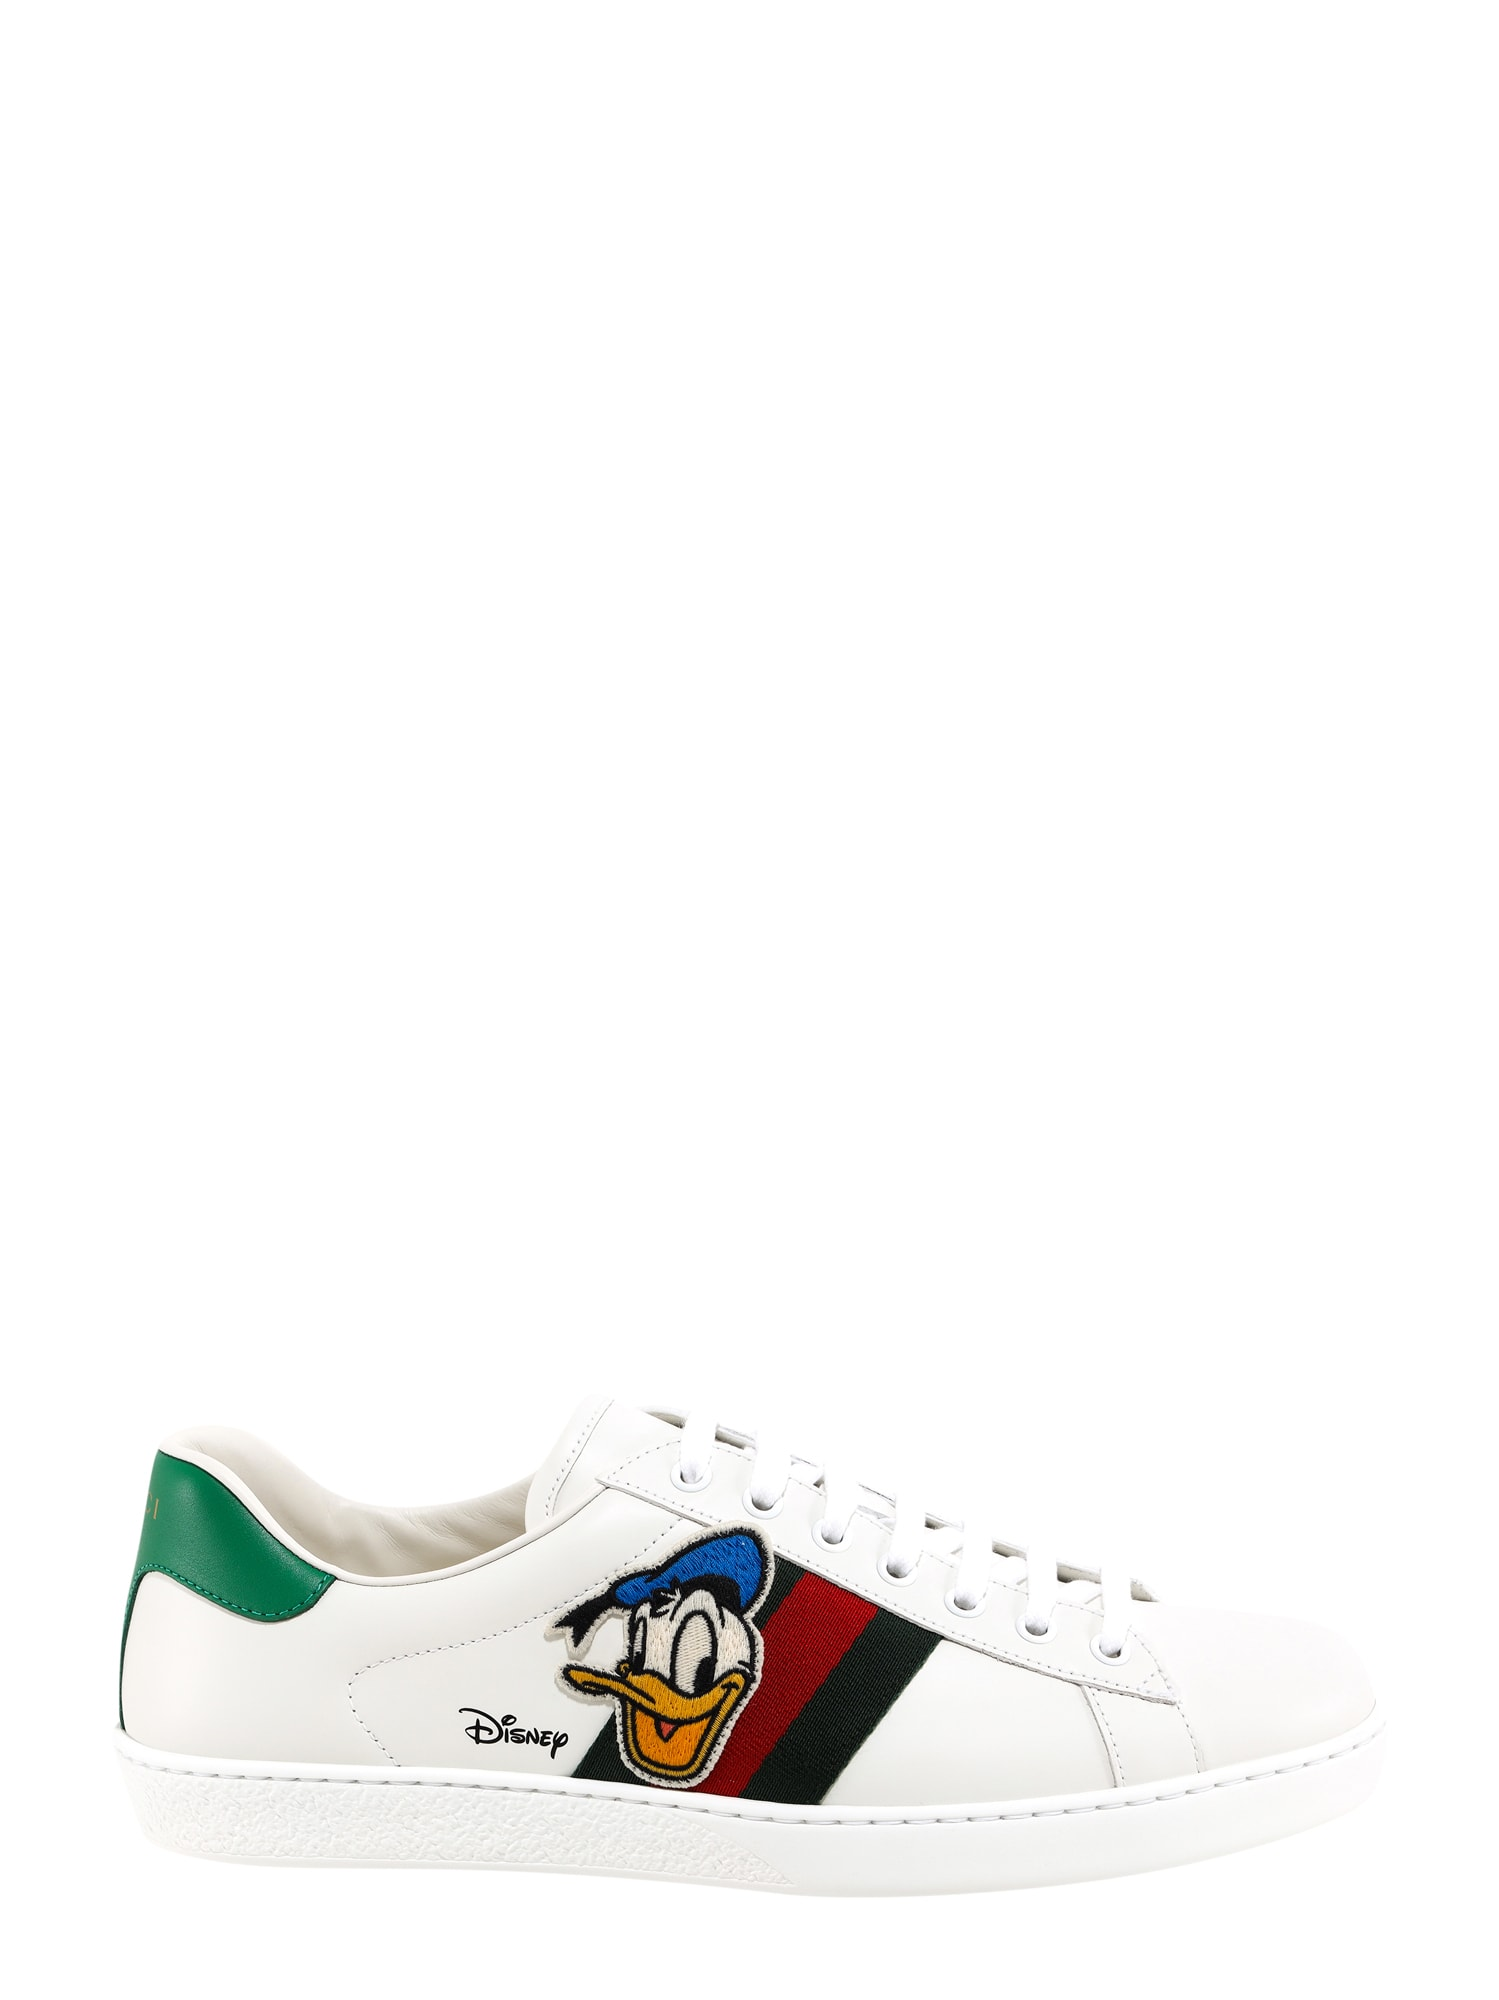 Gucci Donald Duck Disney X Gucci Sneakers